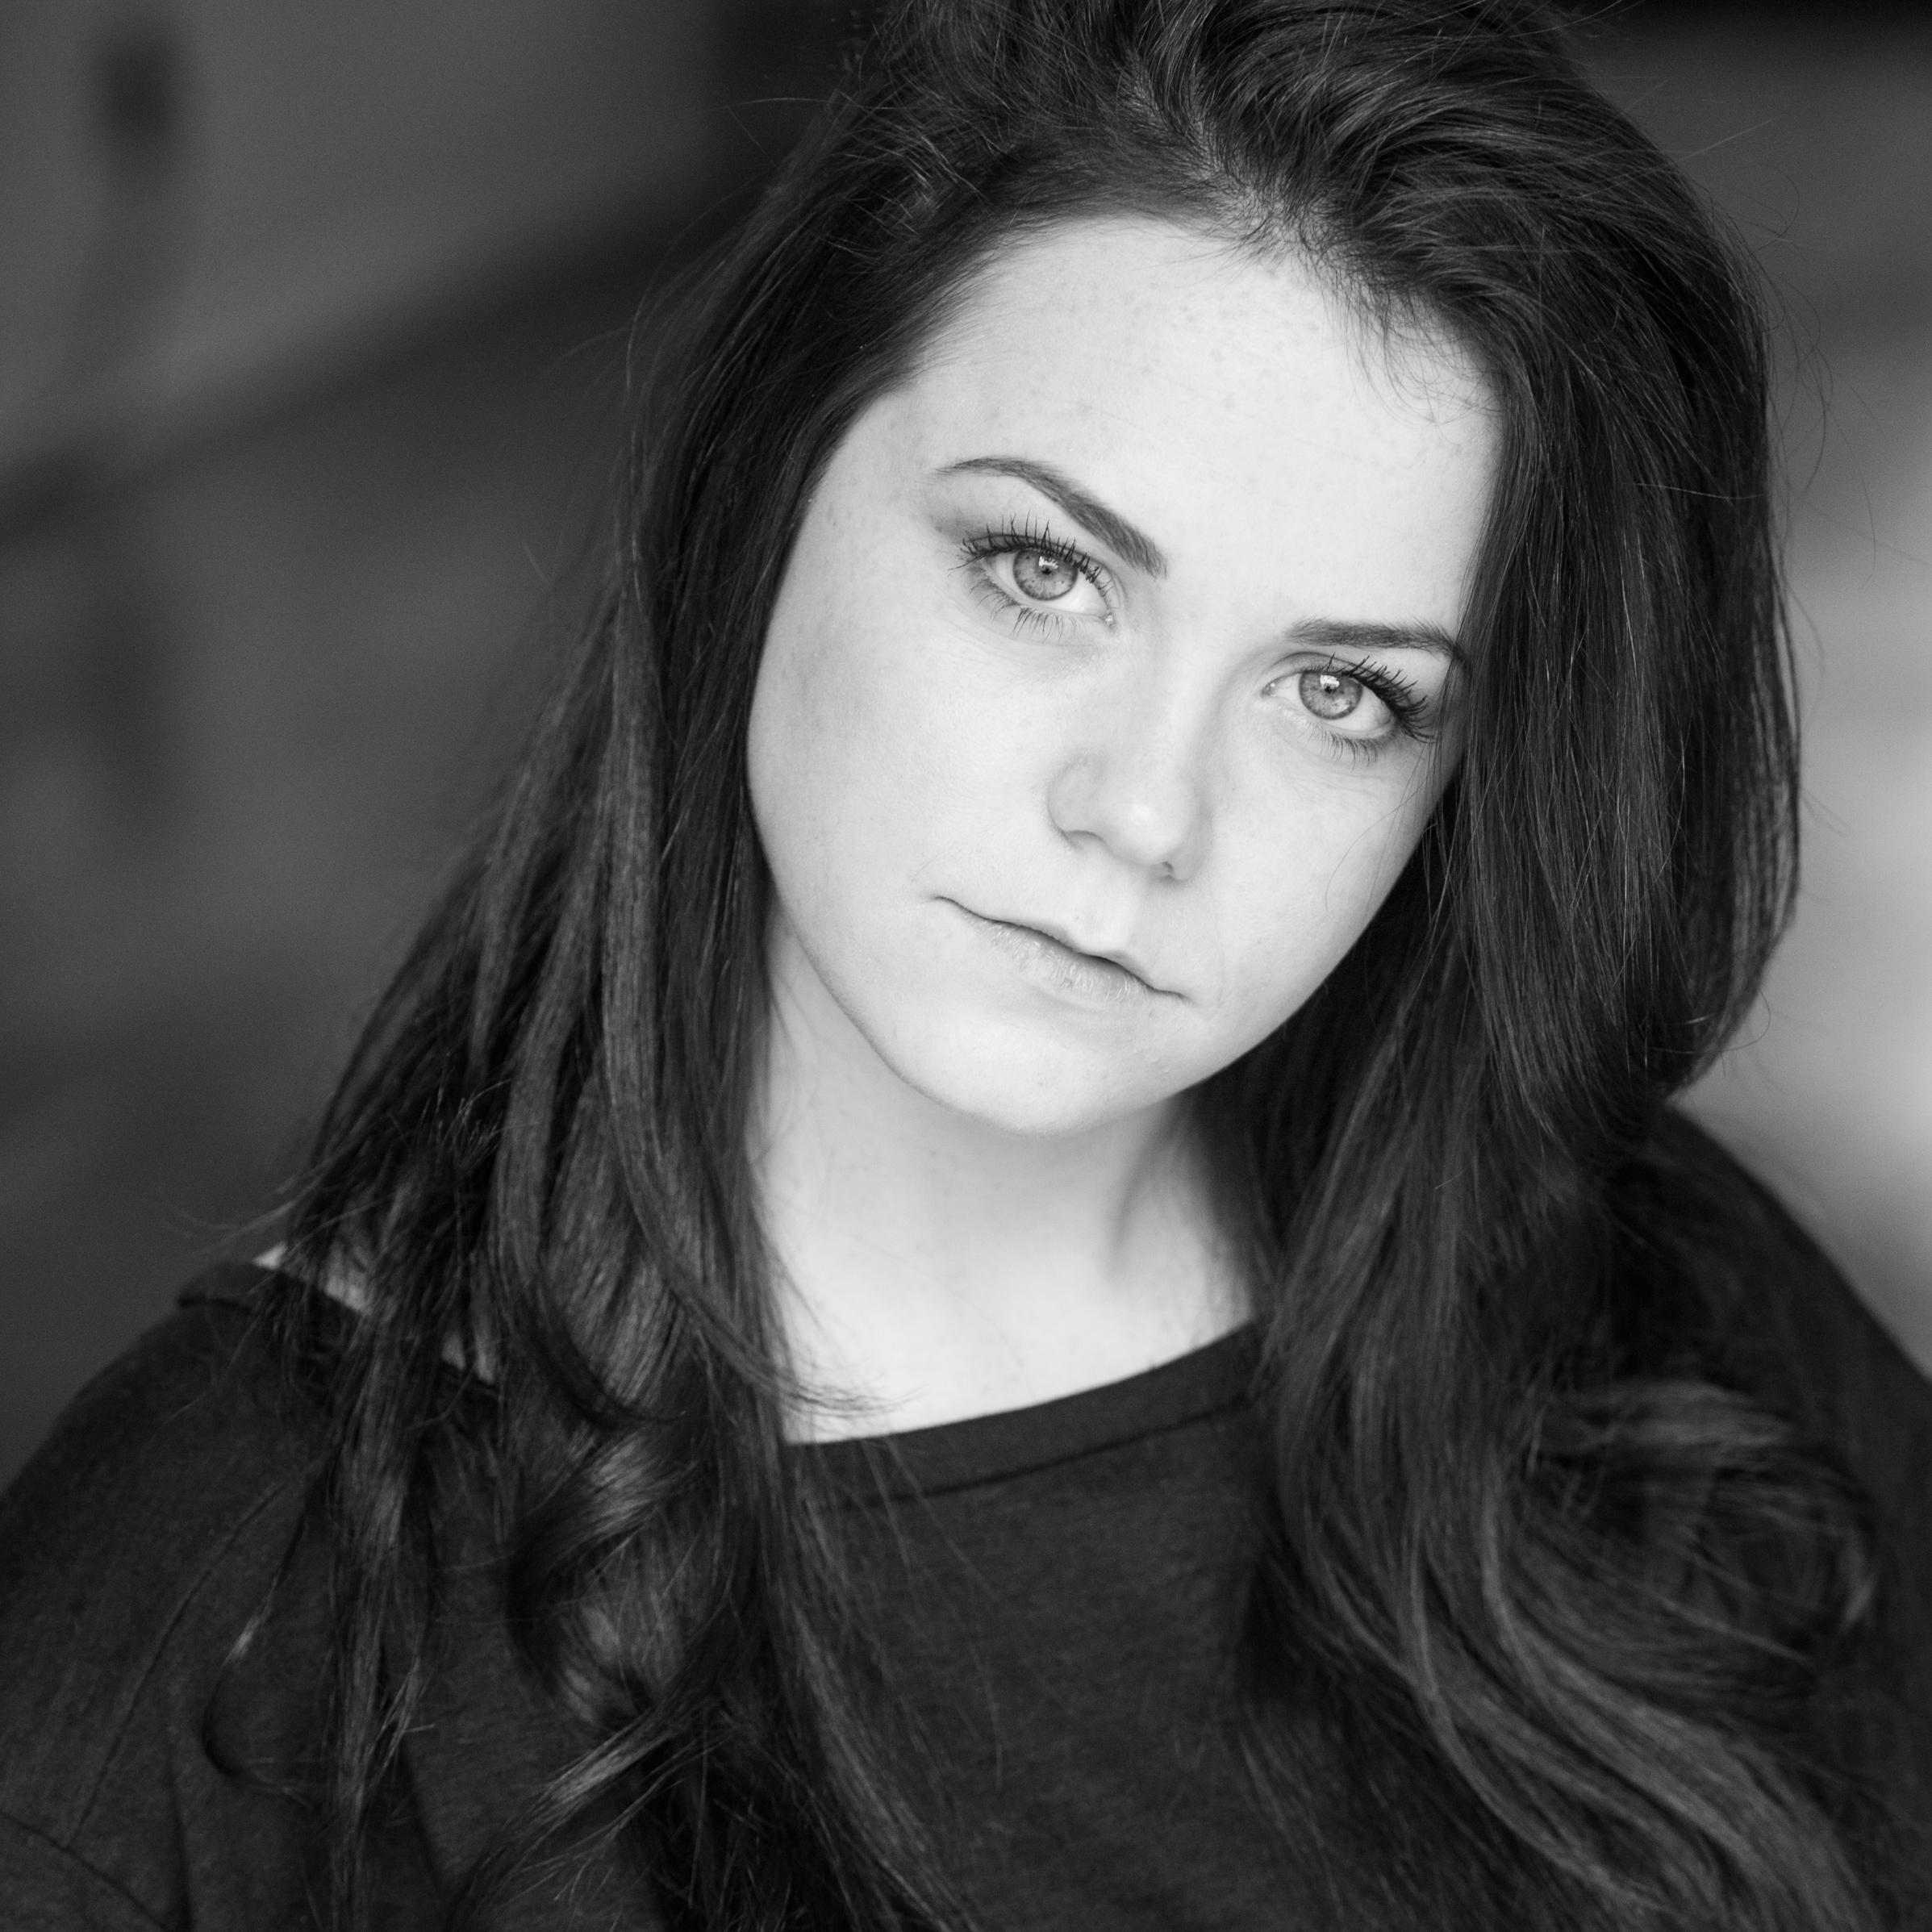 Melissa McGrath / Actor (Amy)